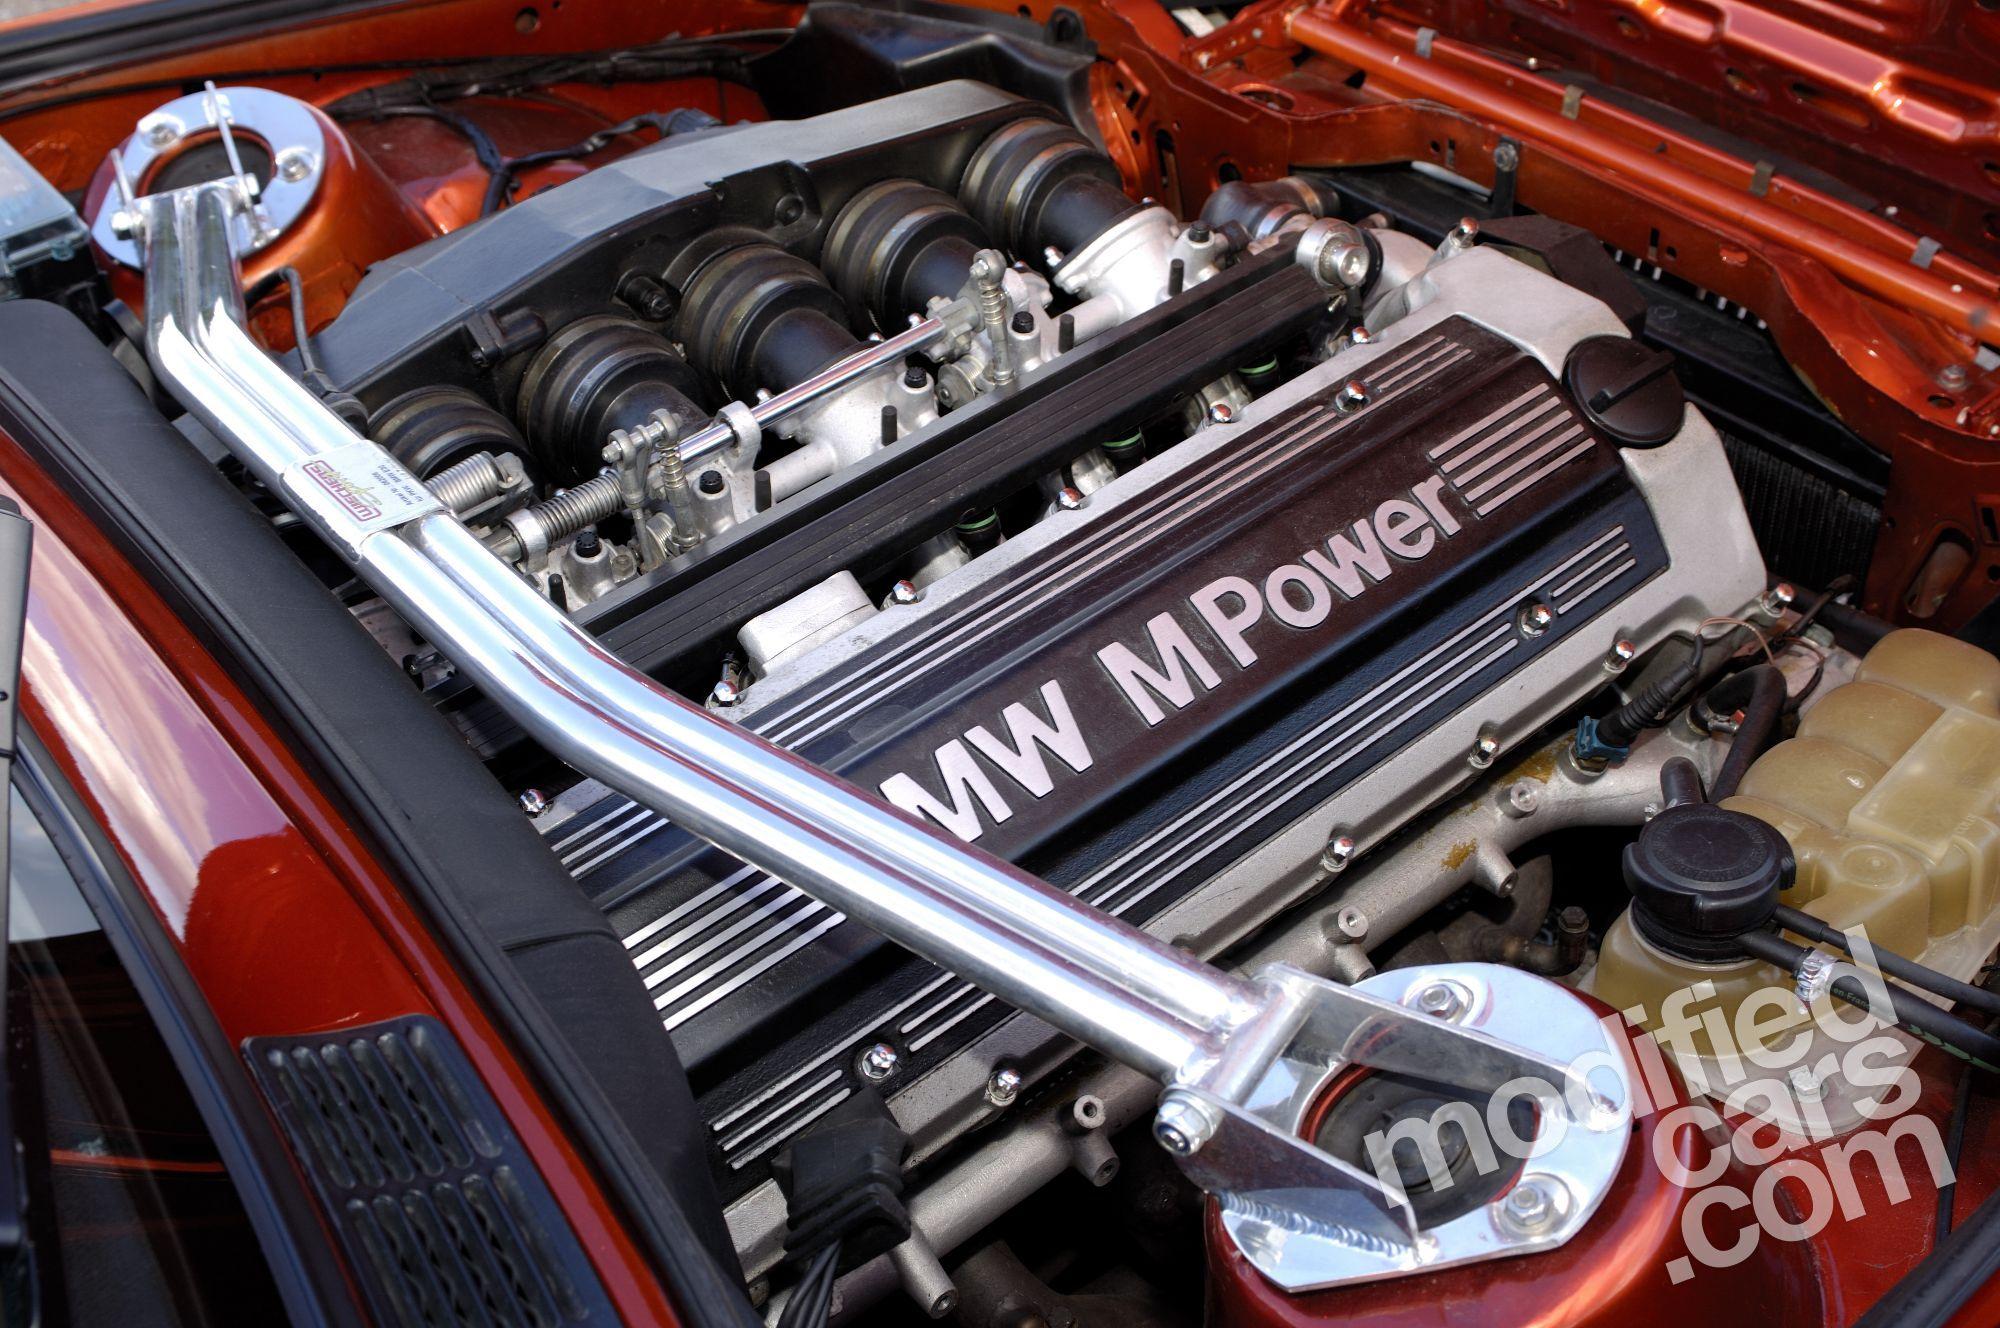 bmw e30 320i whit s38 engine swap 360 hp cars. Black Bedroom Furniture Sets. Home Design Ideas